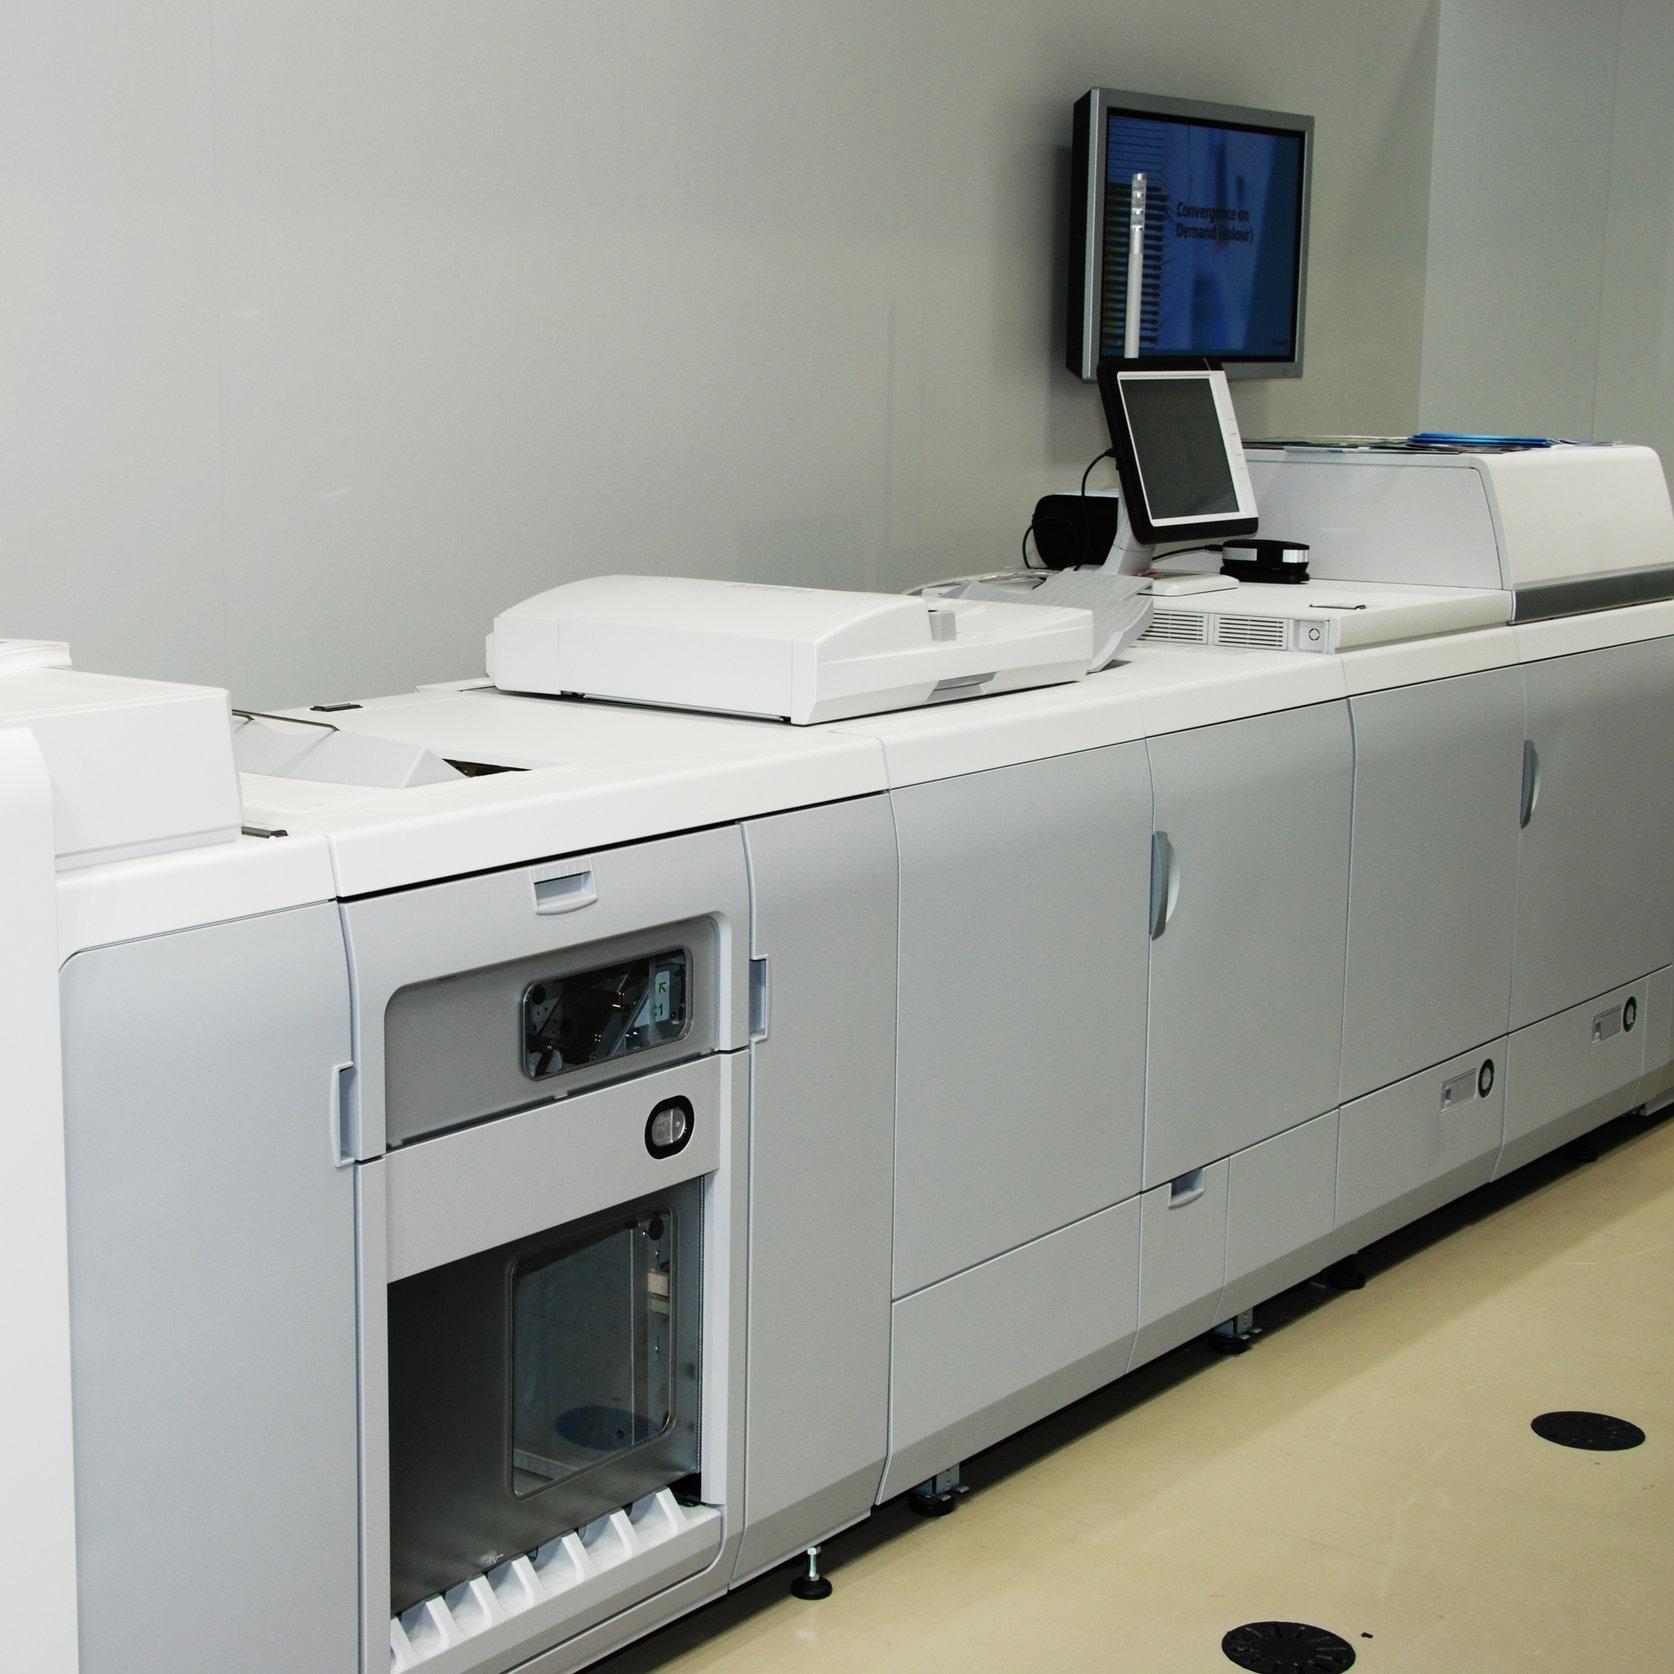 Copies & Digital Printing